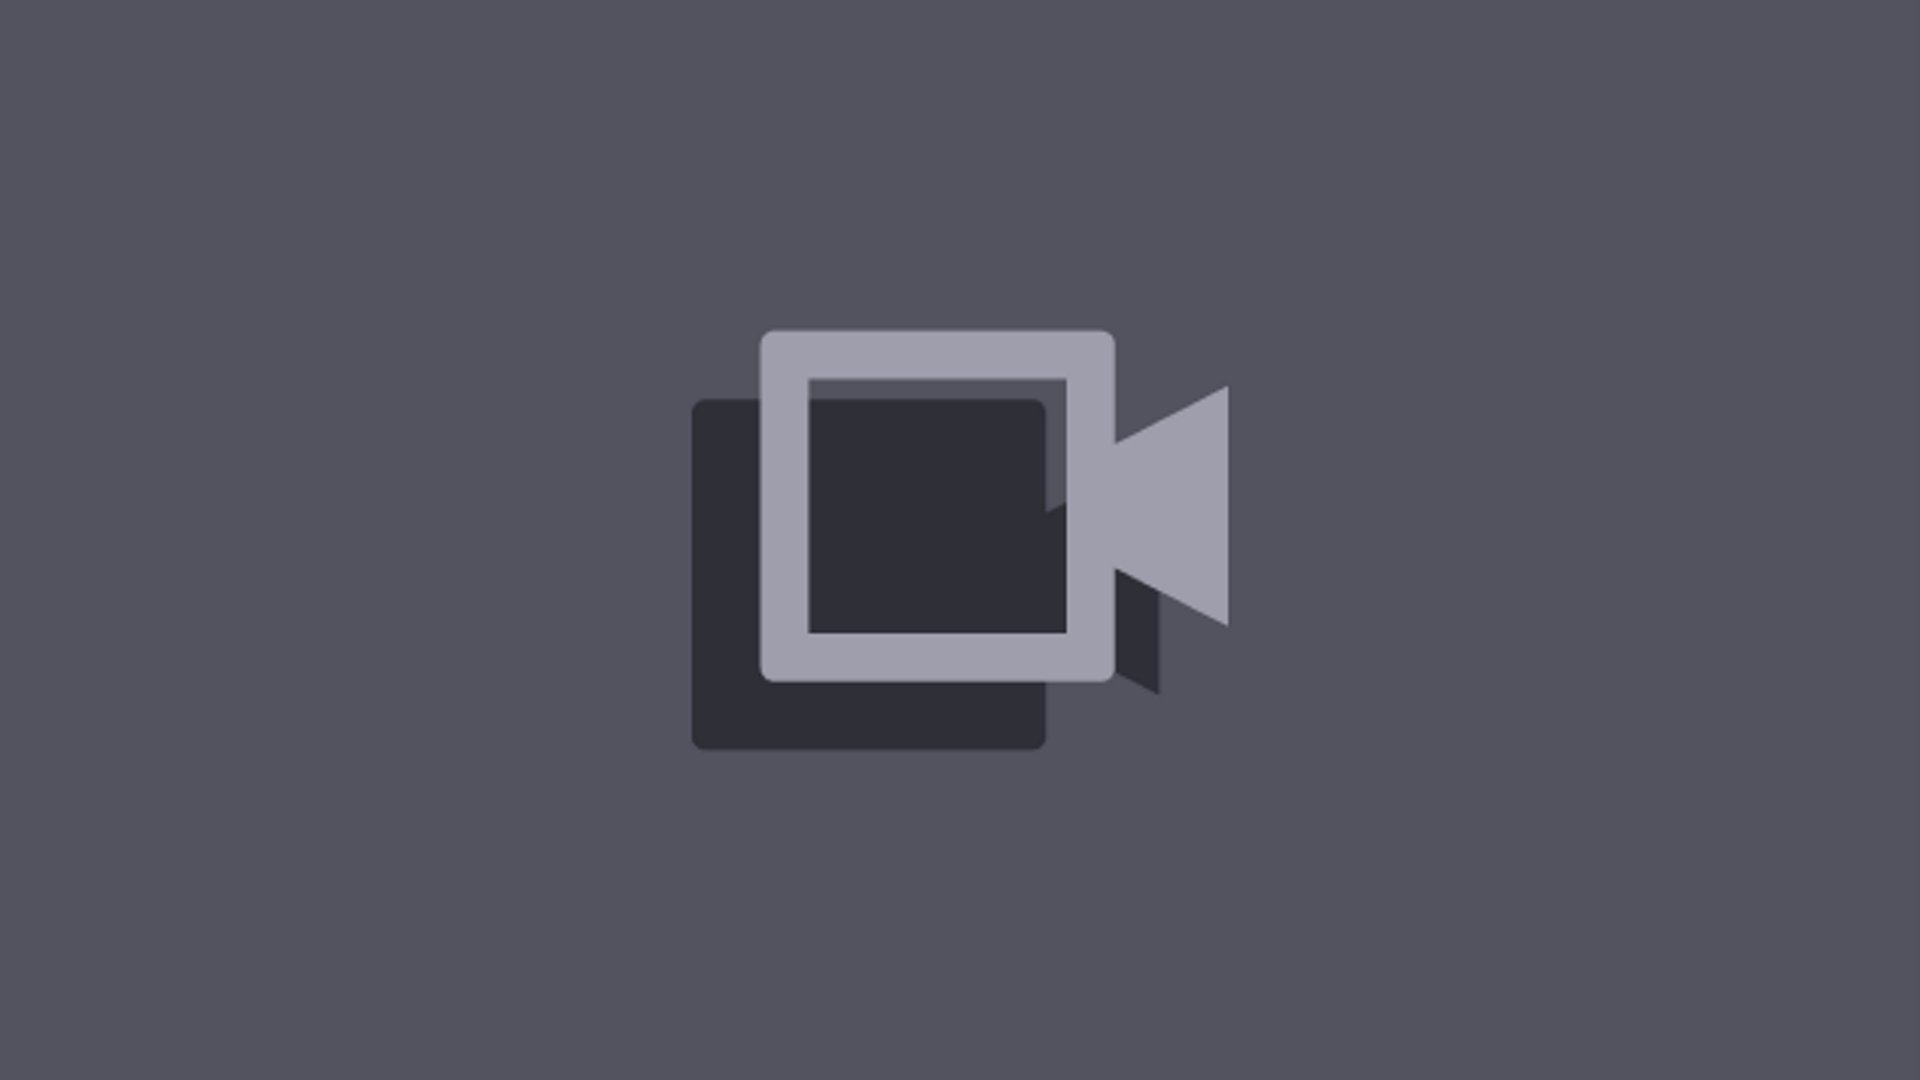 krallz - Live】PikoLive - Twitch, Game, Entertainment, Video Online